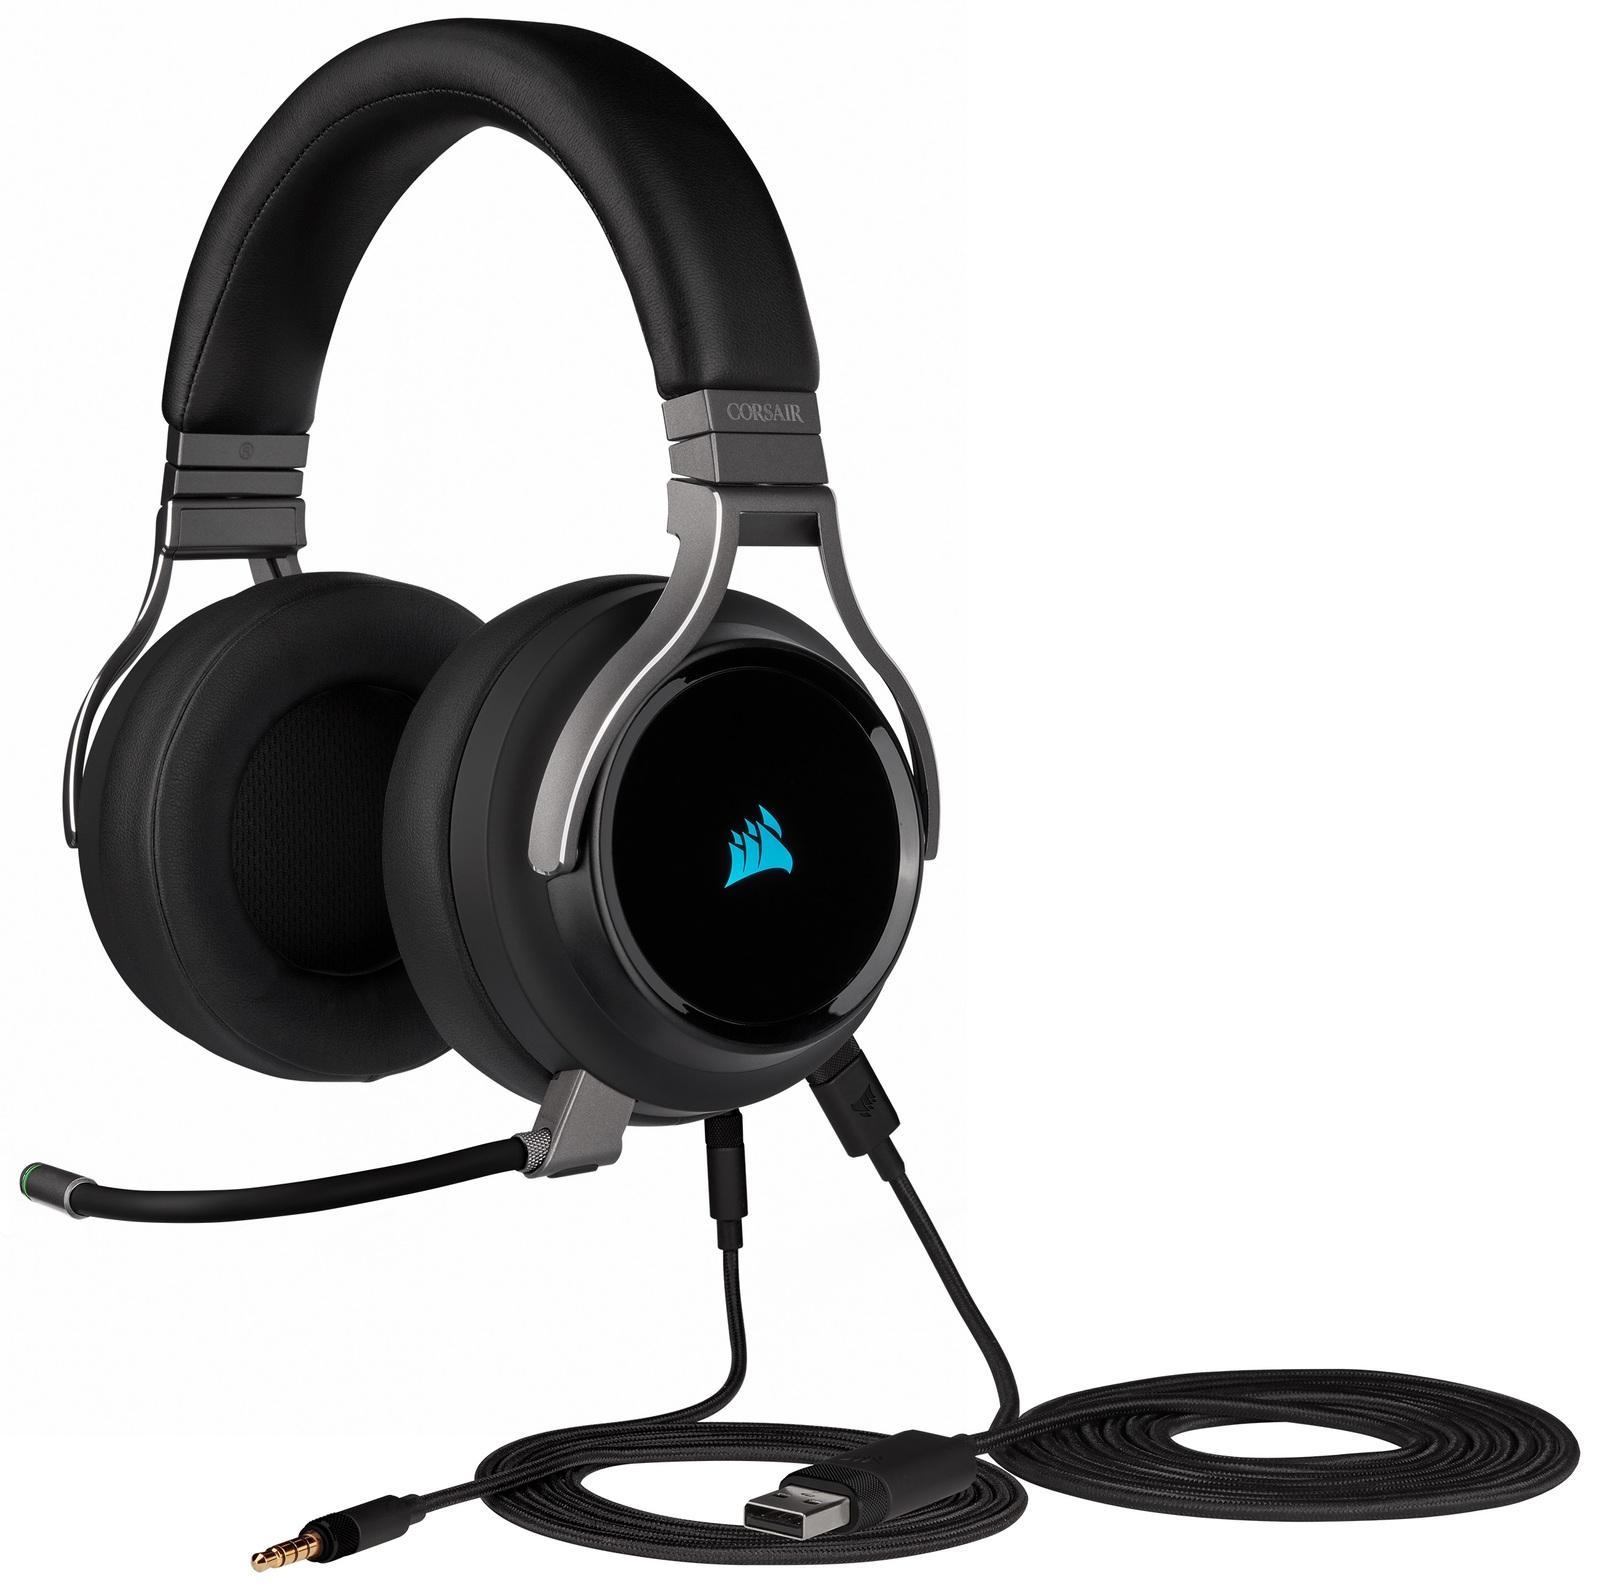 Corsair Virtuoso RGB Wireless Gaming Headset (Black) for PC image